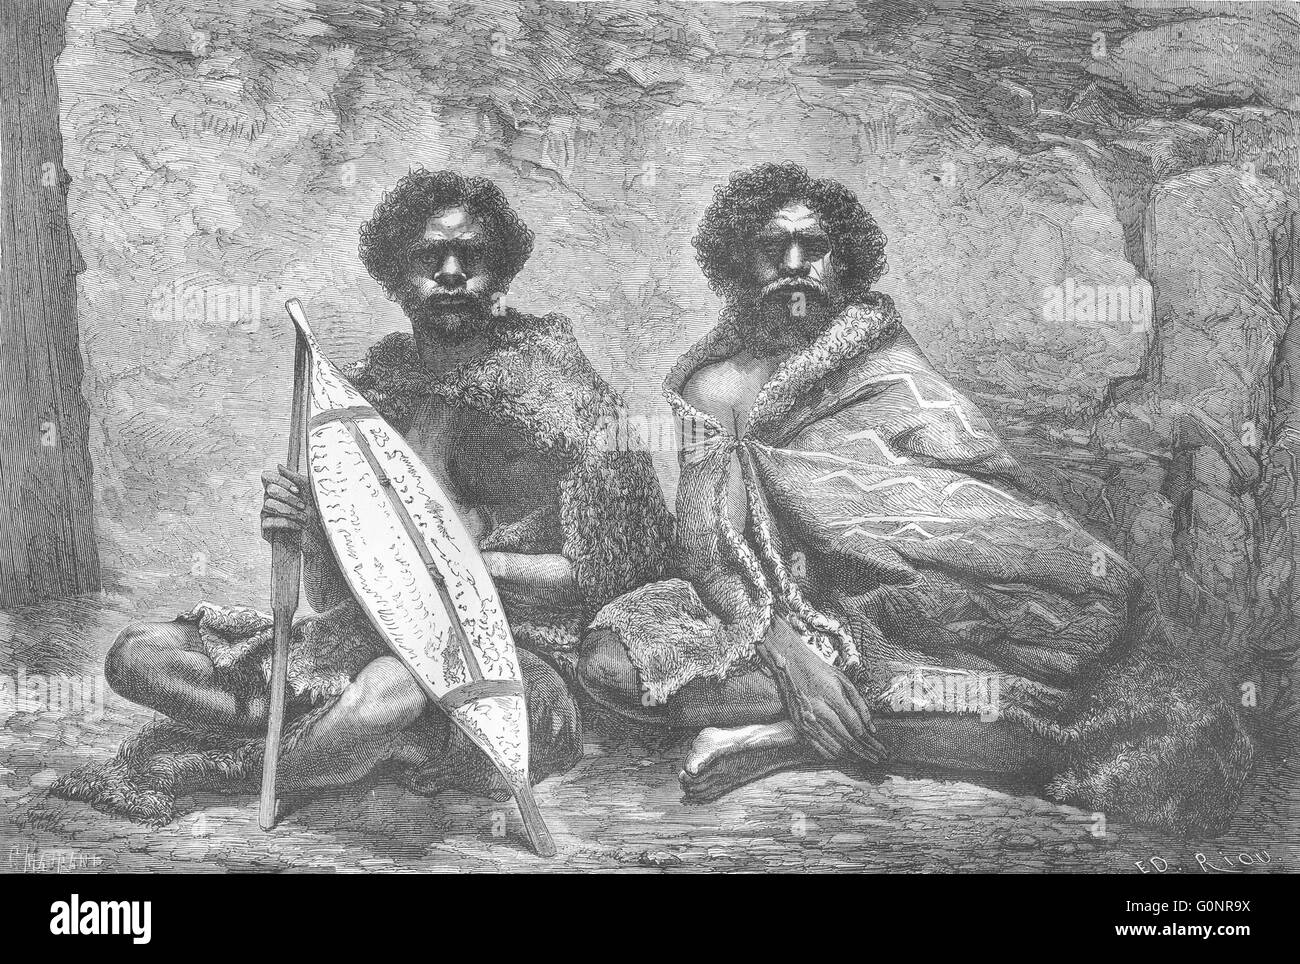 AUSTRALIA: Natives Shield of Bark Eucalyptus, antique print 1870 - Stock Image